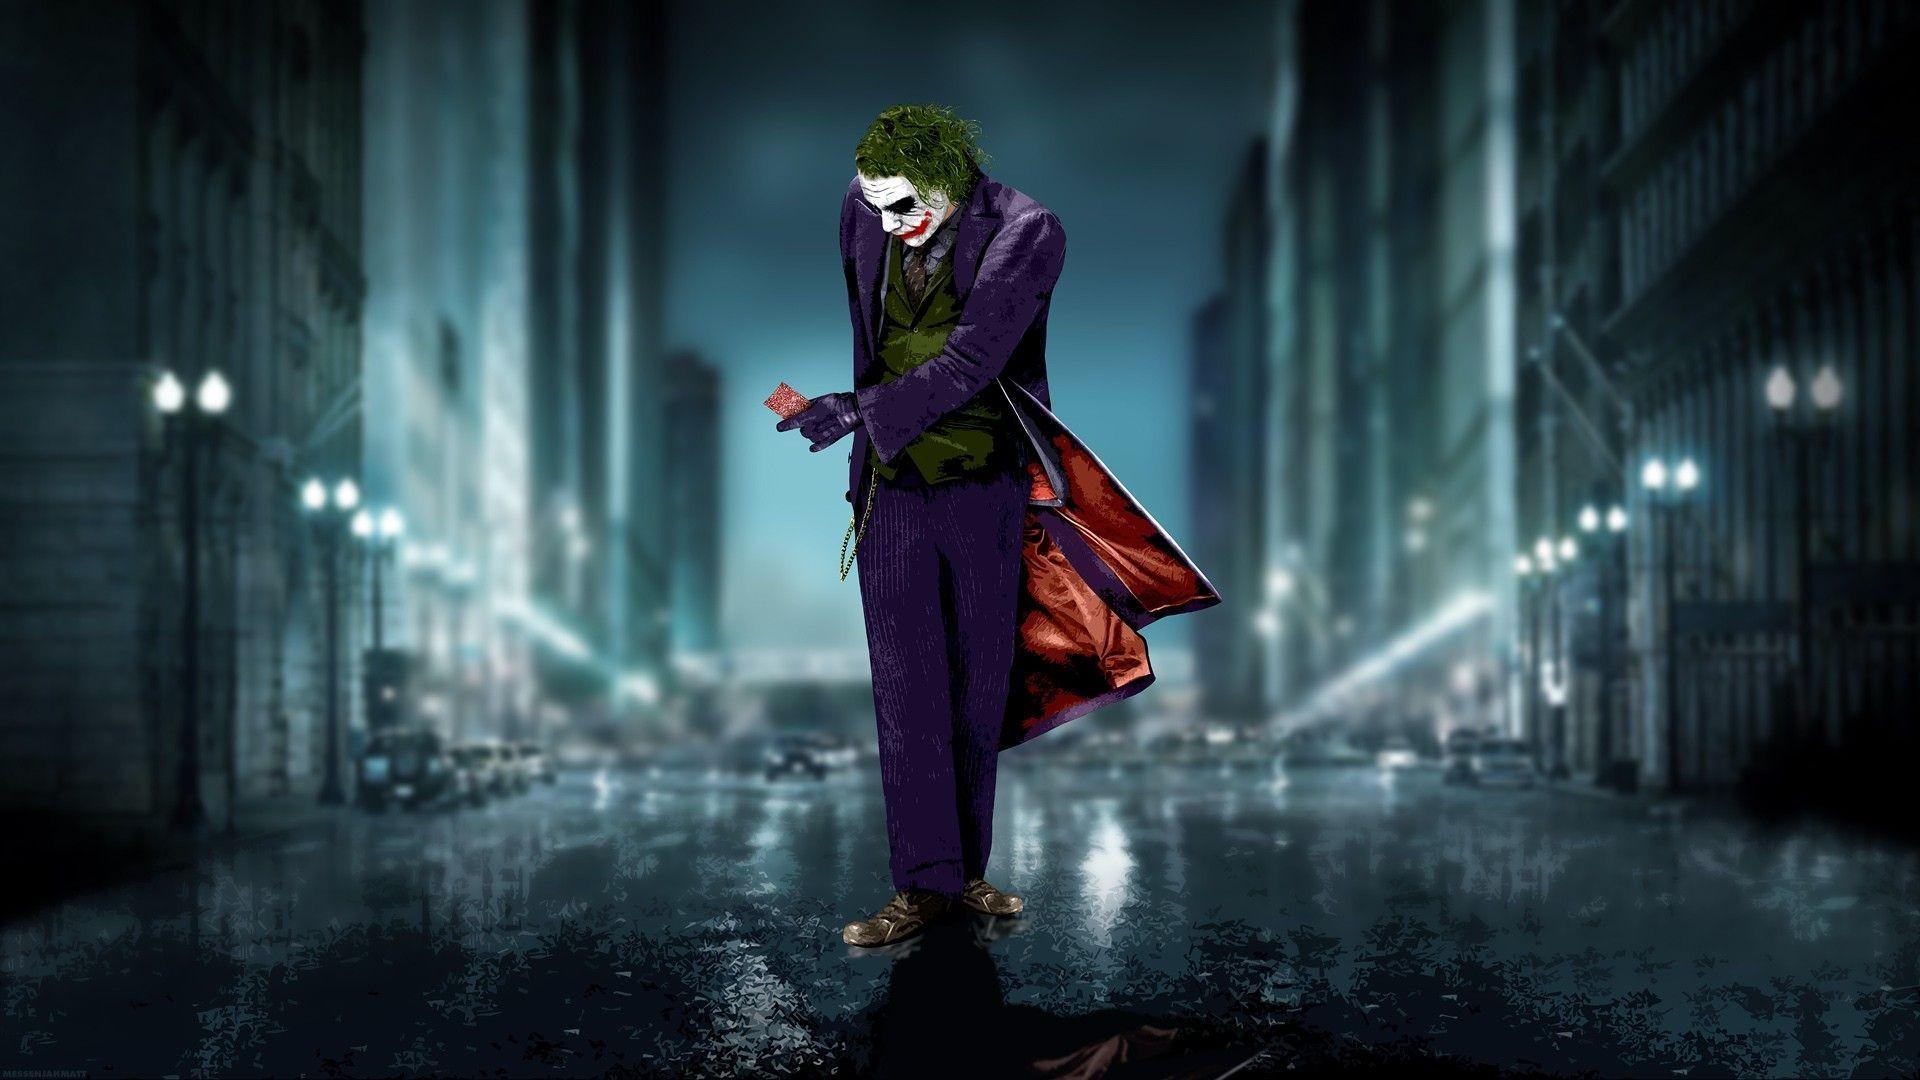 Joker Hd Wallpapers Backgrounds Wallpaper Data Src Dark Knight Wallpaper Joker 1920x1080 Wallpaper Teahub Io